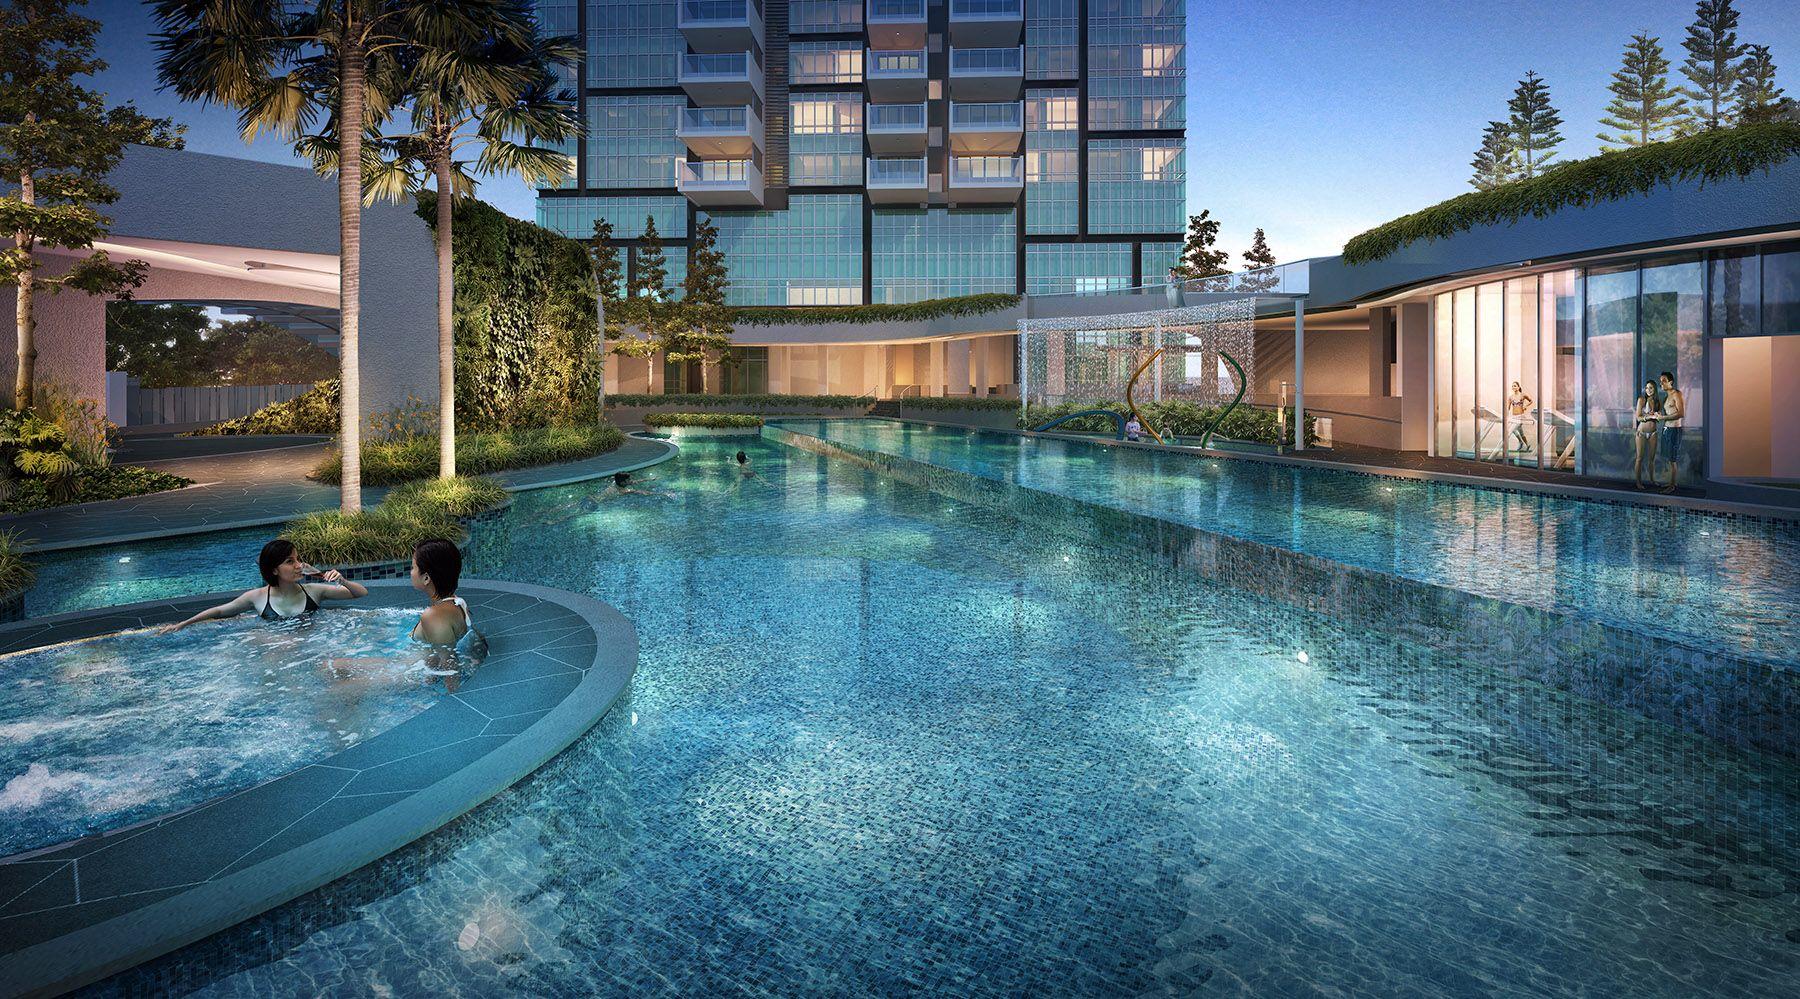 8 St Thomas Swimming Pool   SG Luxury Condo for Sale